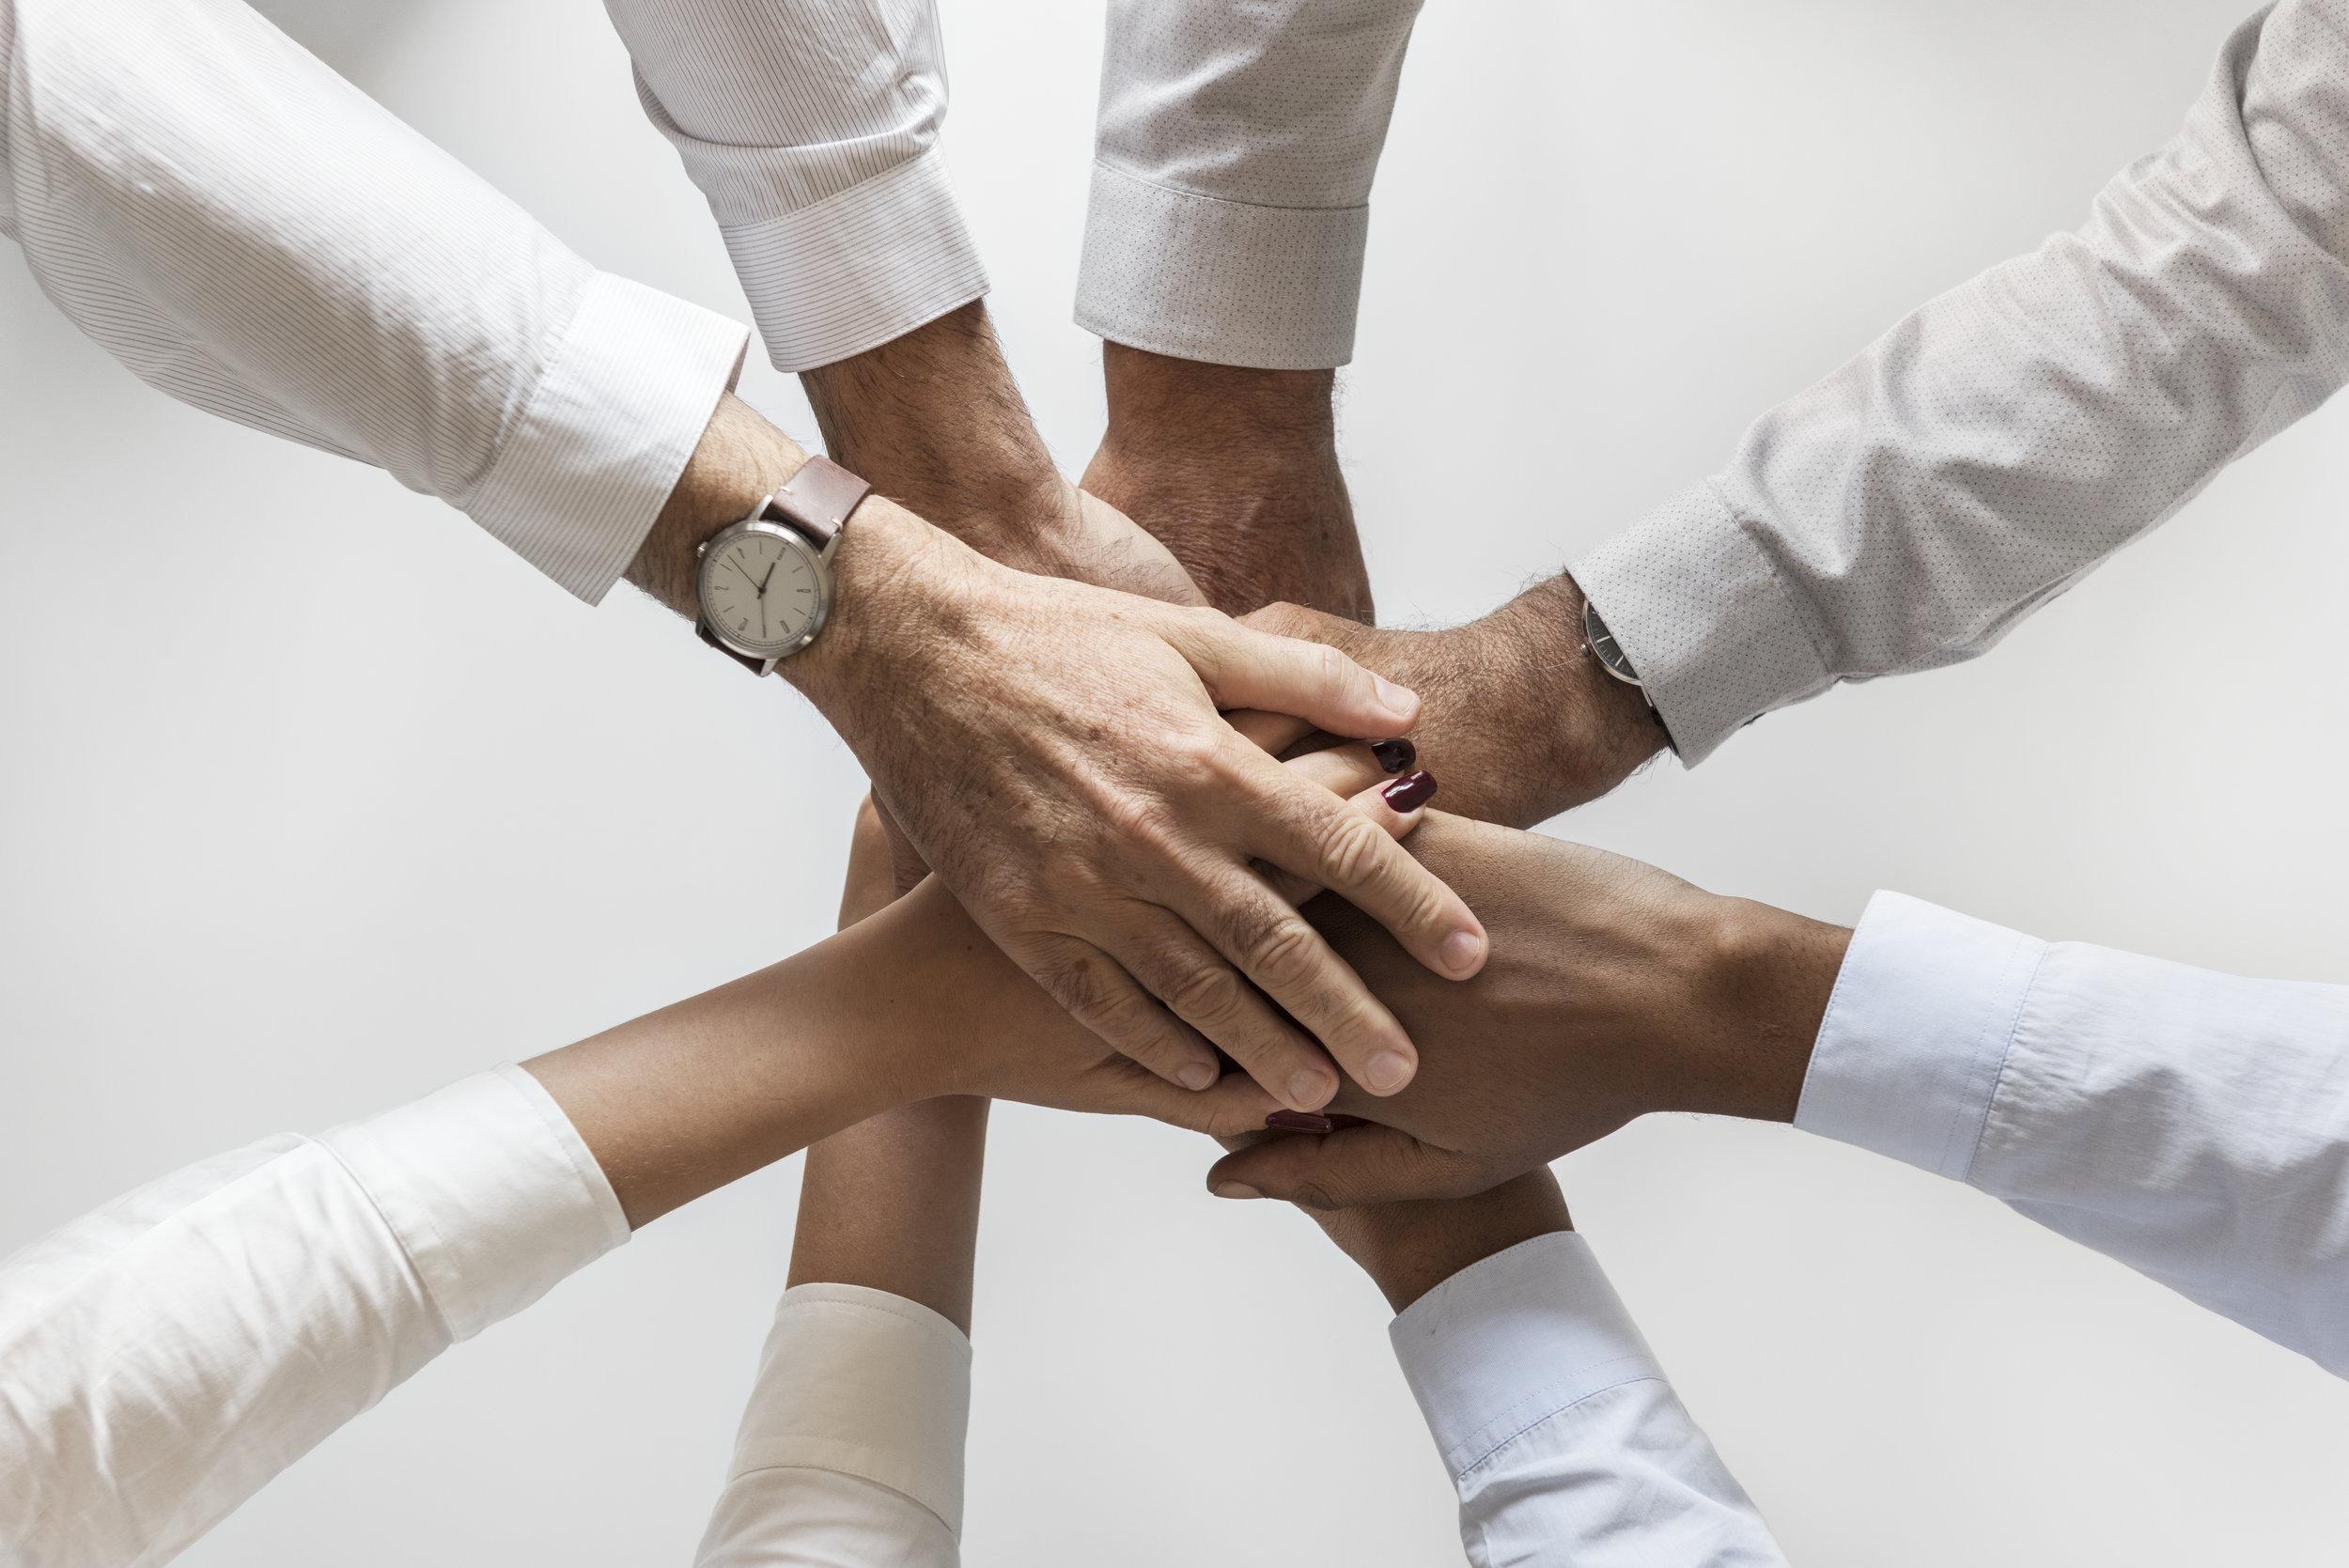 Business hands joined together teamwork